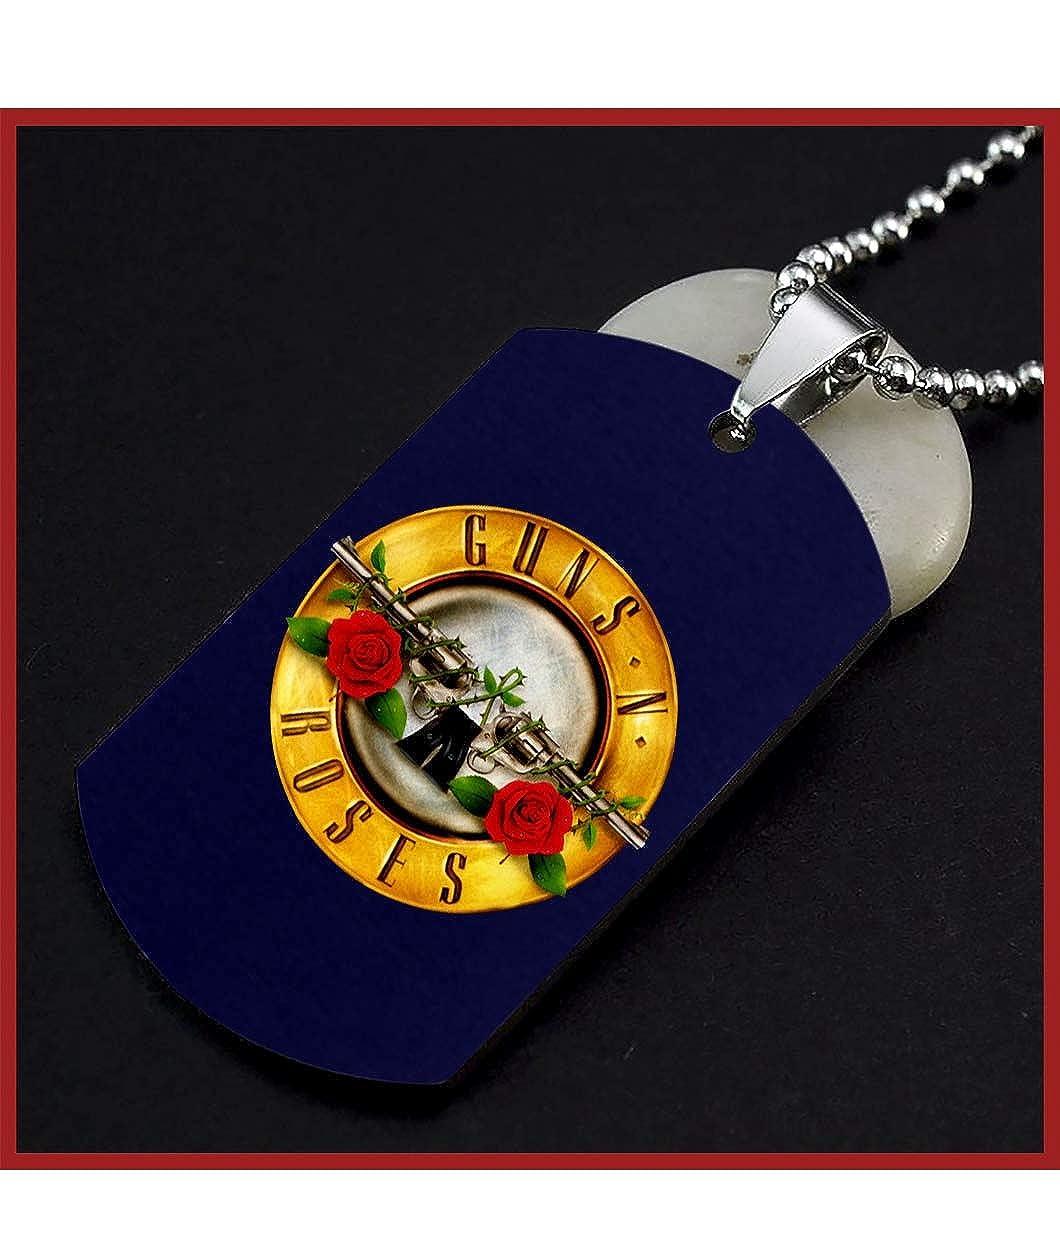 Amazon.com: TAMPSHOP Divertido Guns N Roses Logo etiqueta ...